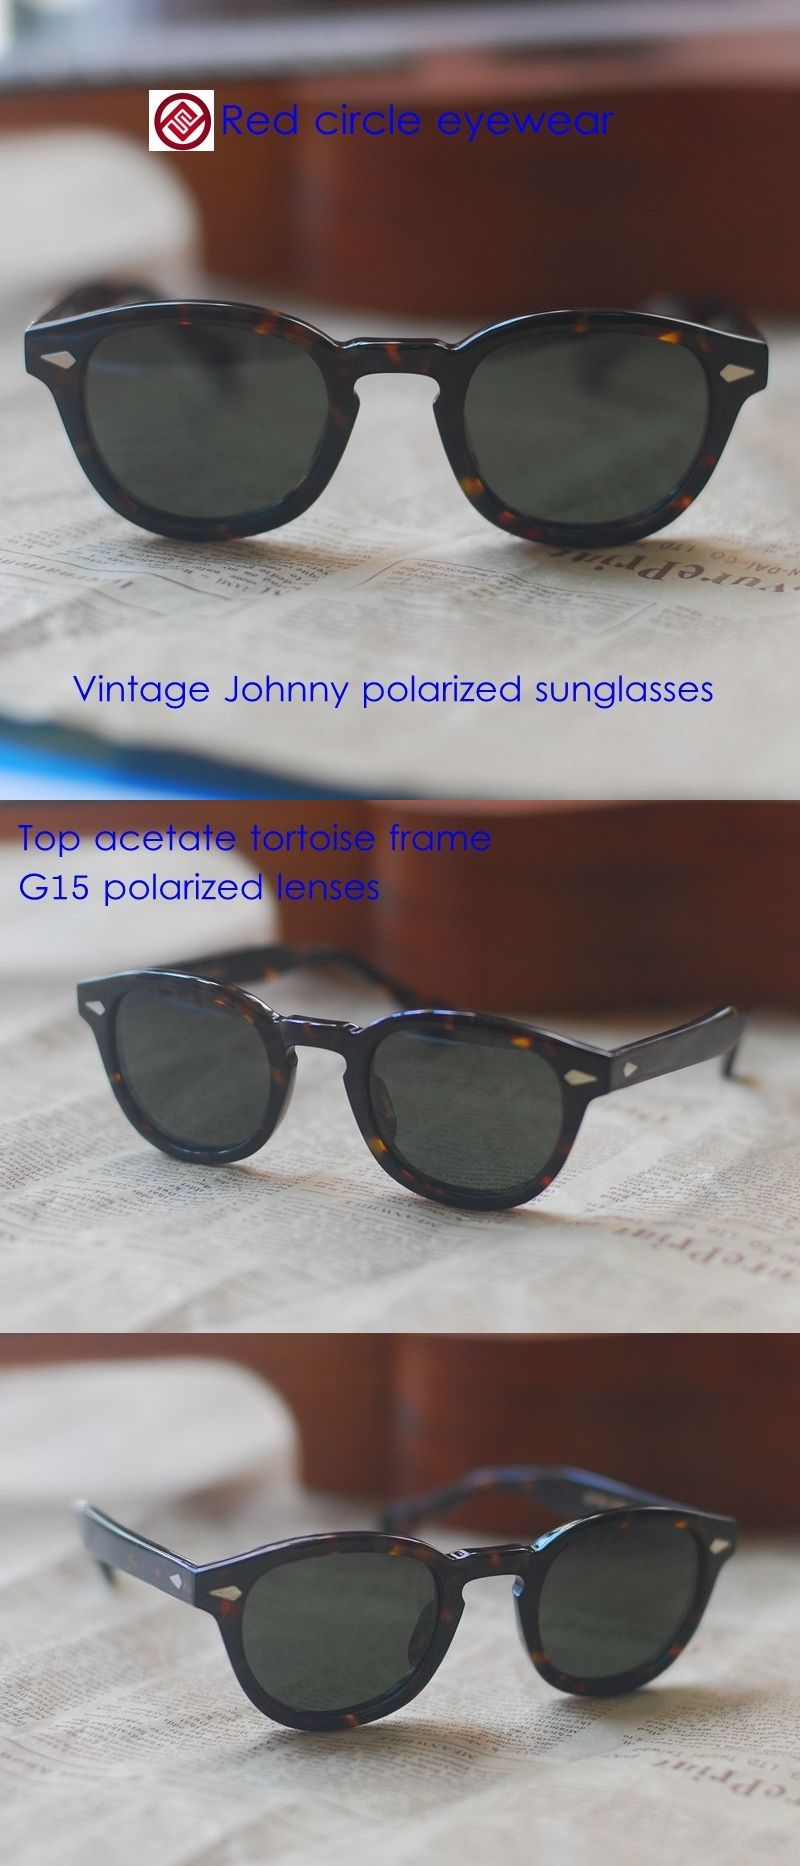 1a5092a0a2d Sunglasses 48559  Vintage Johnny Depp Polarized Sunglasses Top Tortoise  Acetate Frame G15 Lenses -